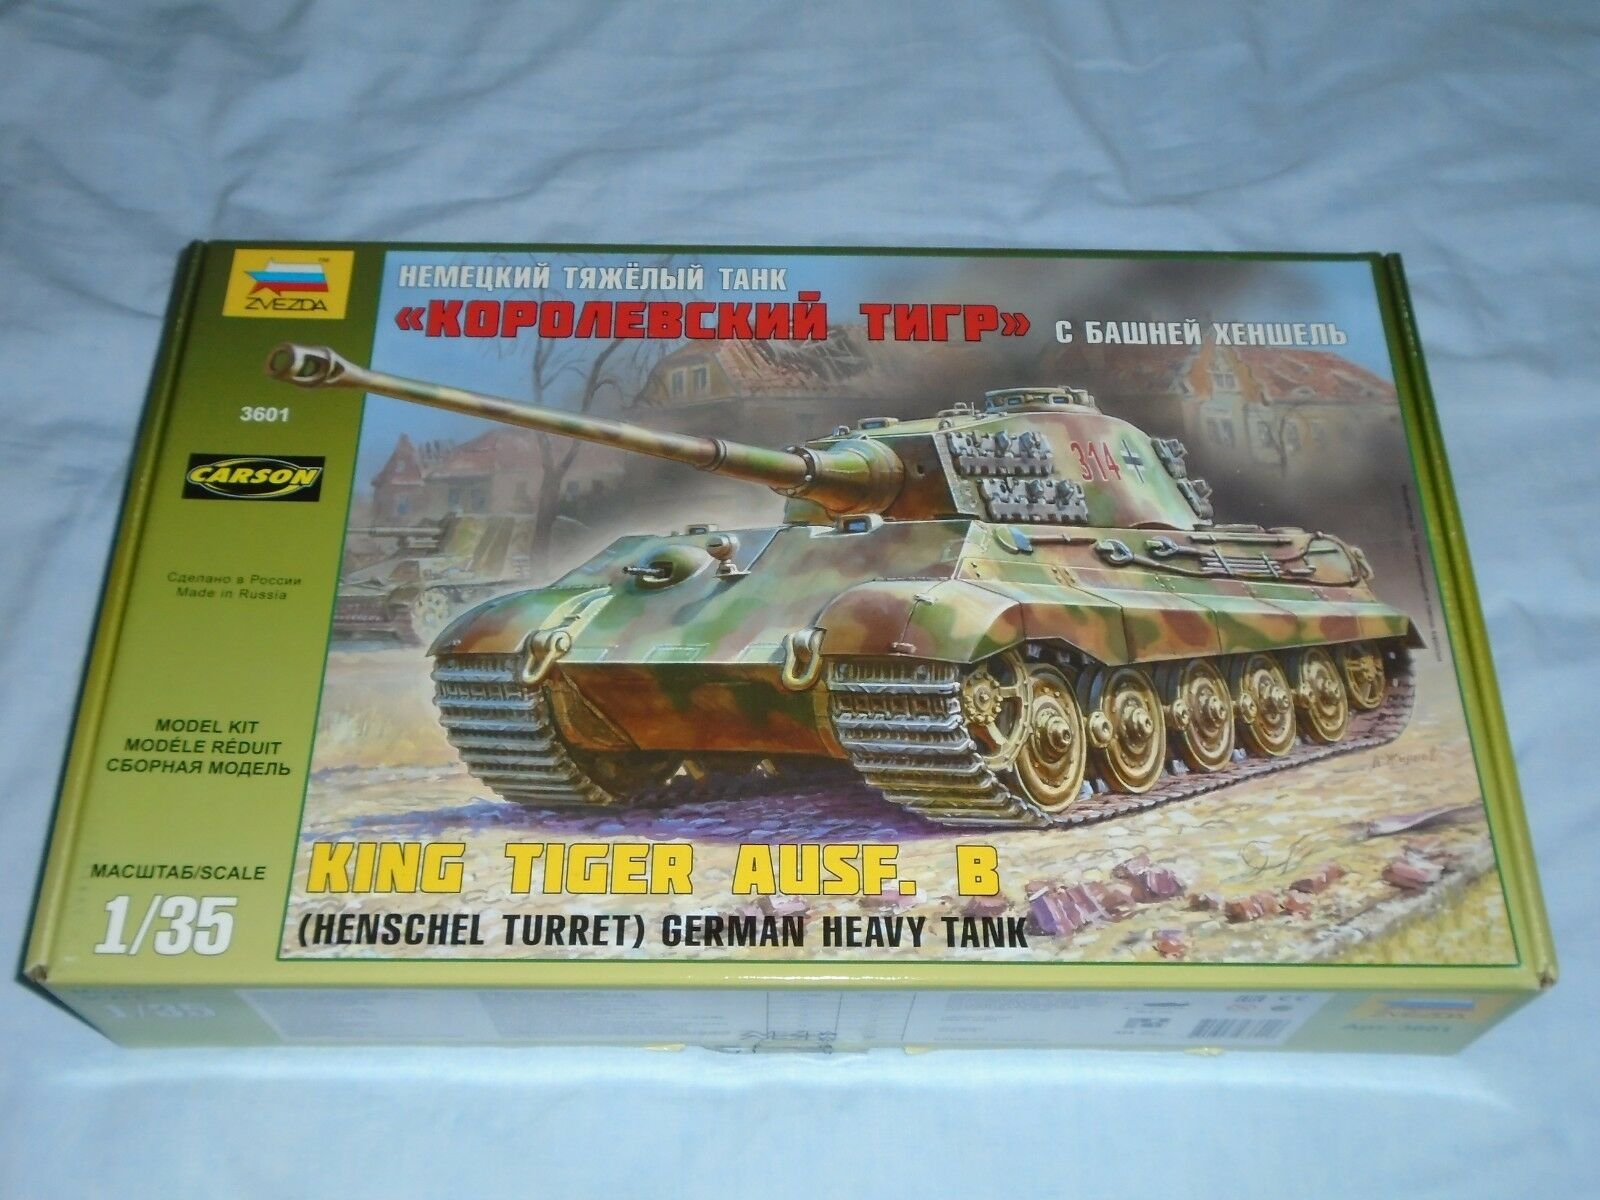 ZVEZDA MODELS 1 35 MODEL KIT 3601 WW2 GERMAN KING TIGER TANK AUSF.B.